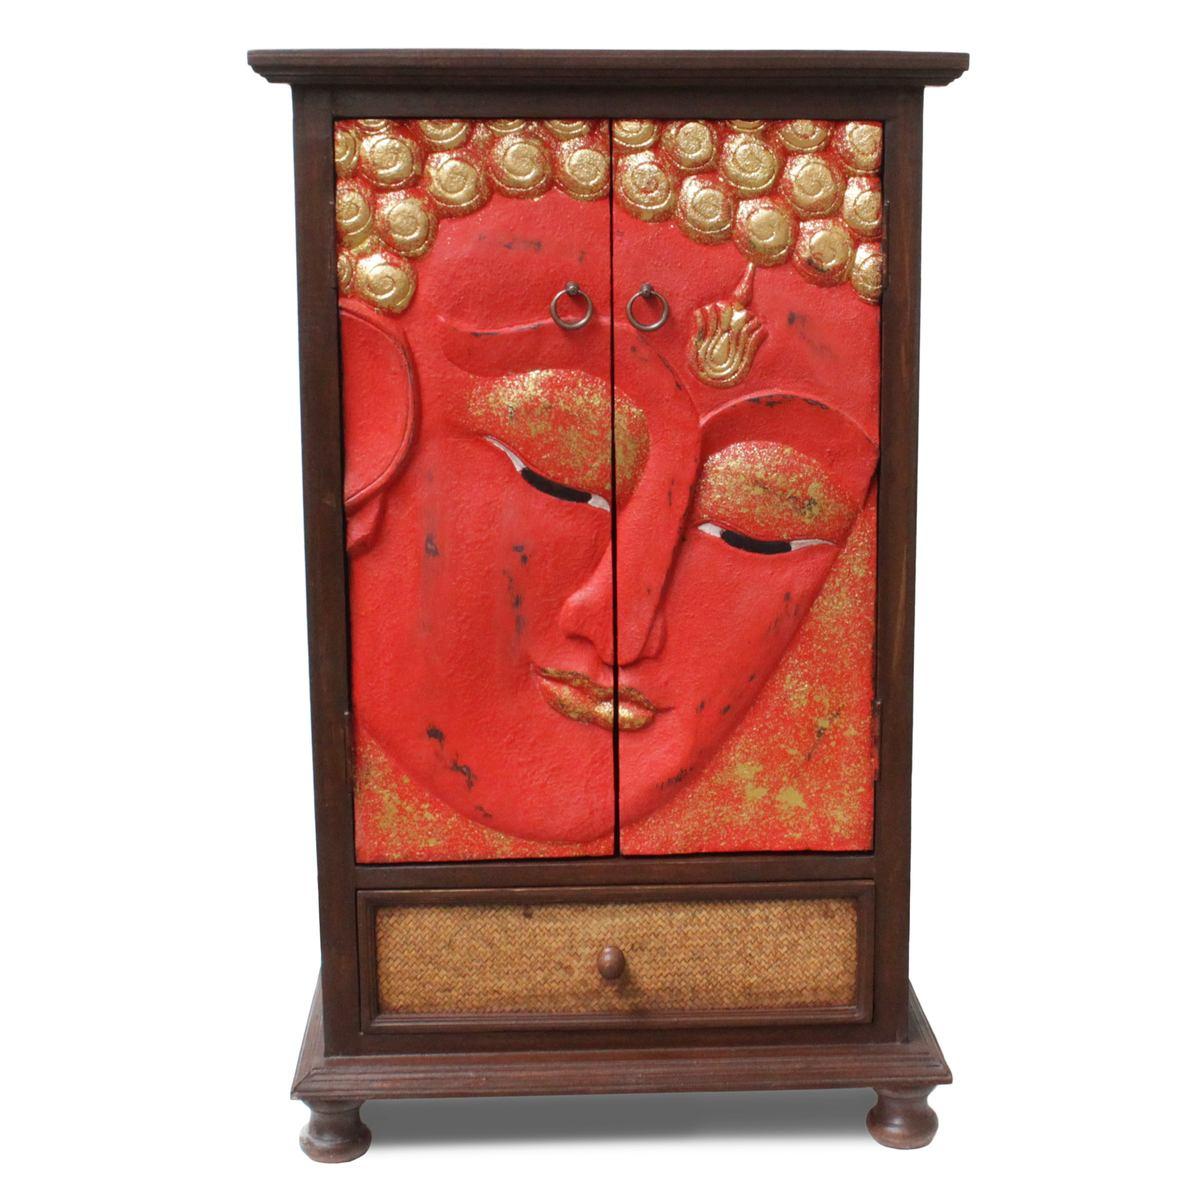 flurschrank buddha gesicht schrank kommode sideboard schubladenschrank rattan rot gold 107 cm. Black Bedroom Furniture Sets. Home Design Ideas